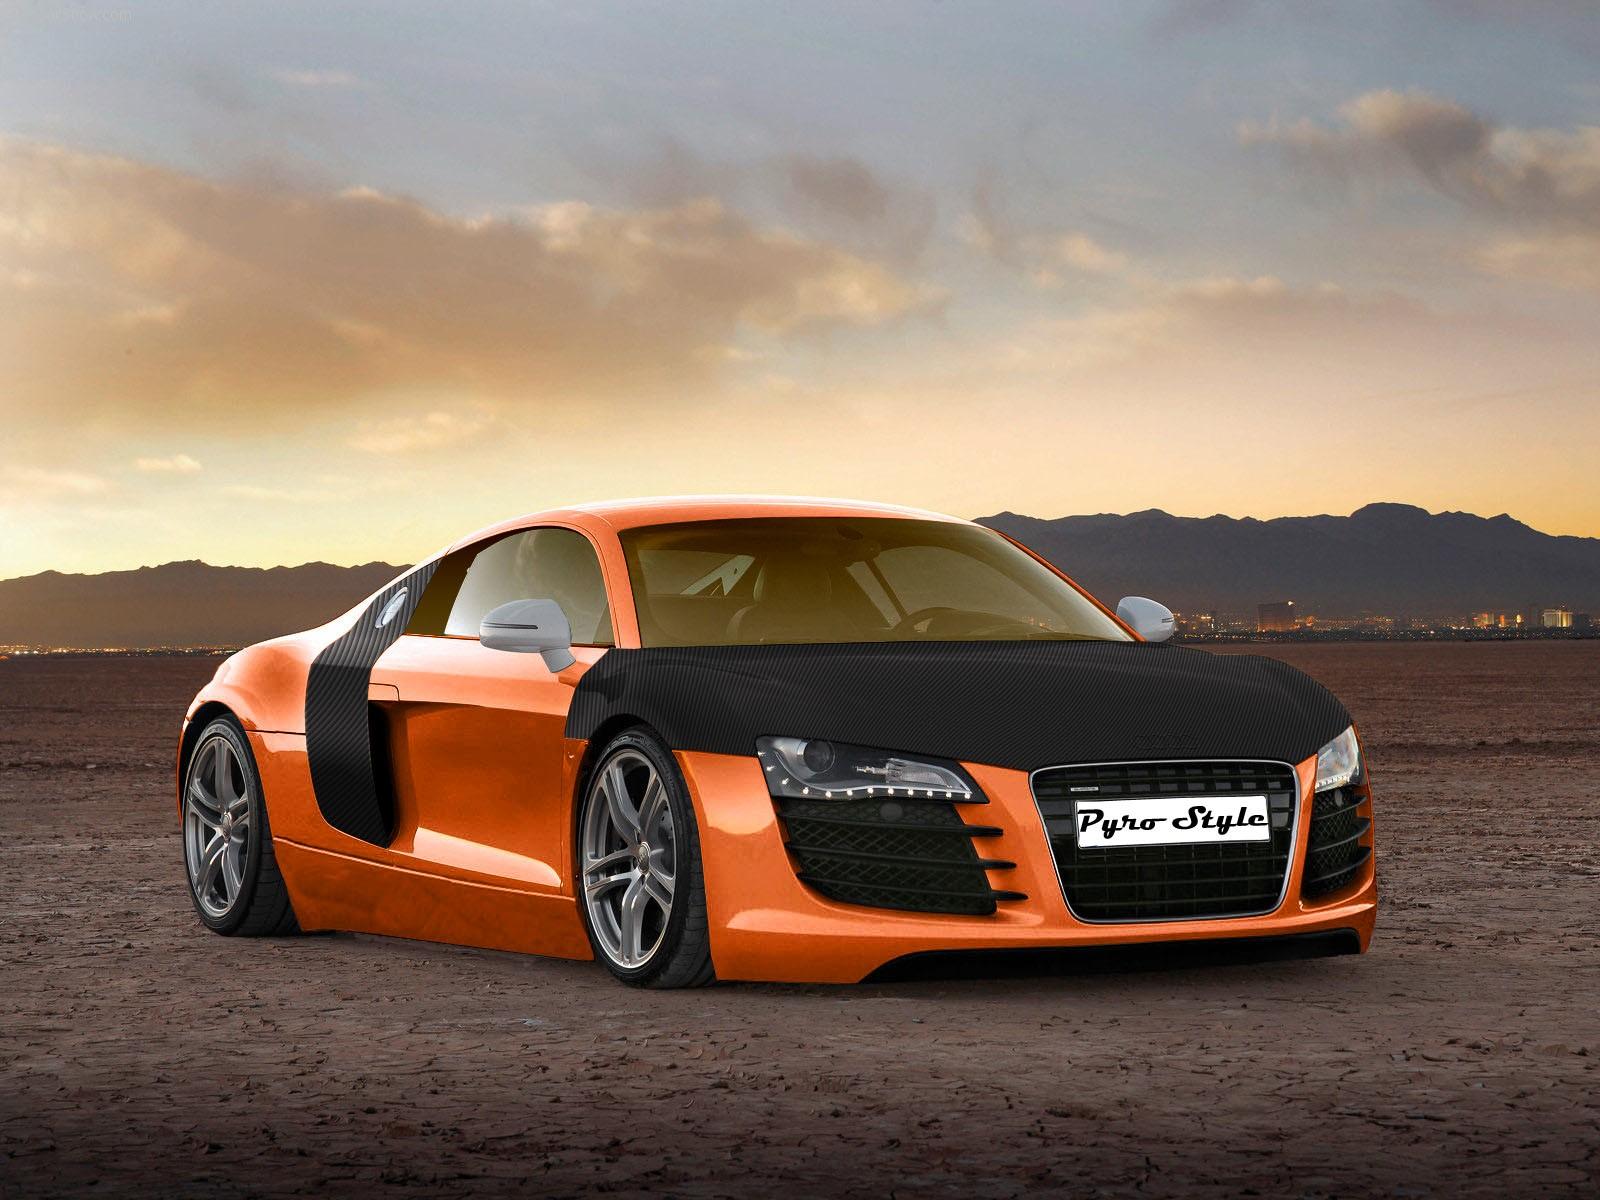 cottocnet audi r8 070 Audi r8 wallpaper download